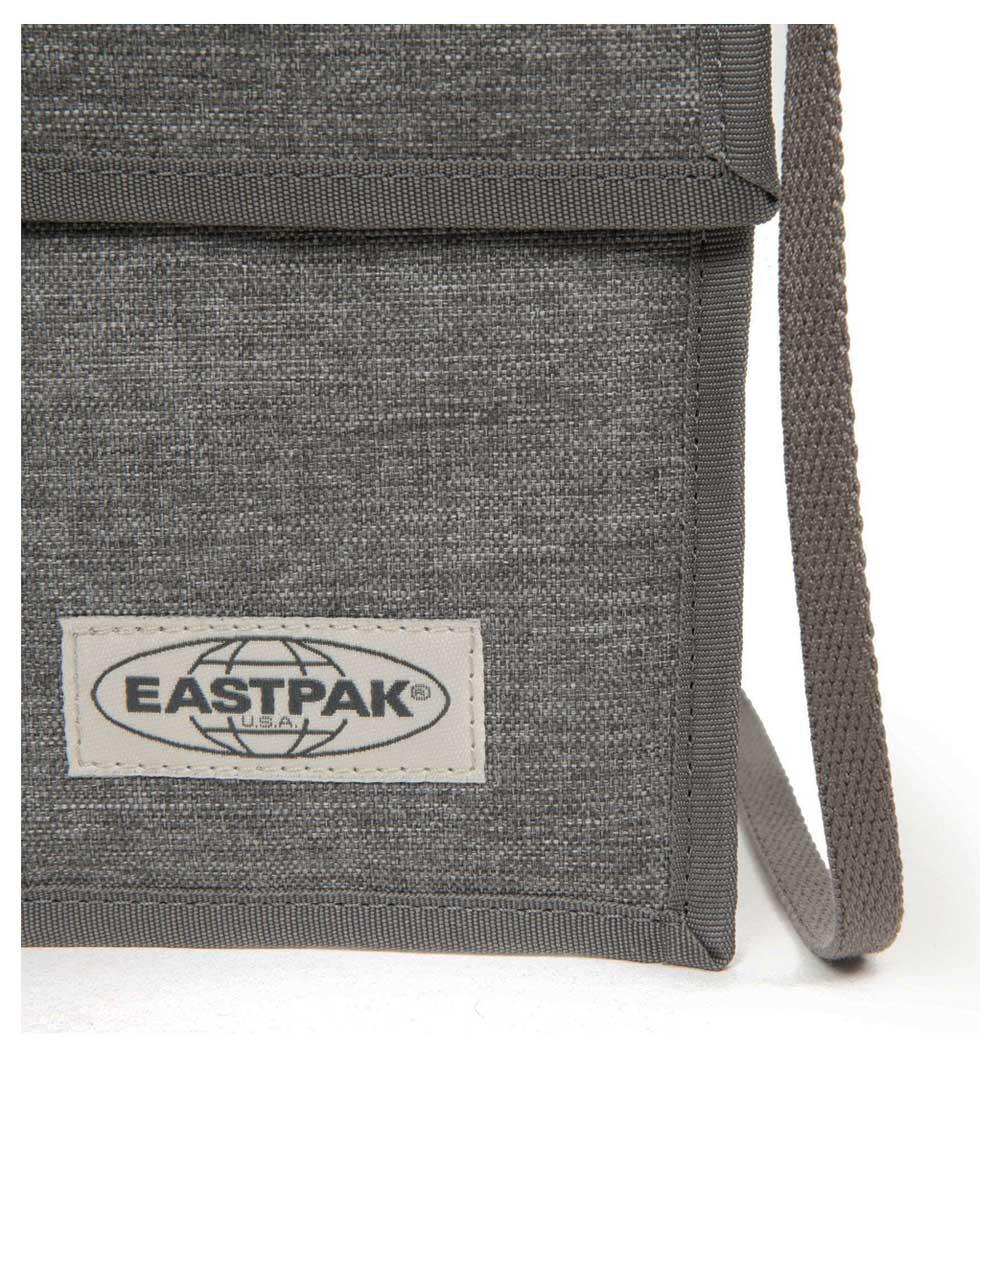 Eastpak Cullen Mini Bag (EK68E B05) Muted Grey